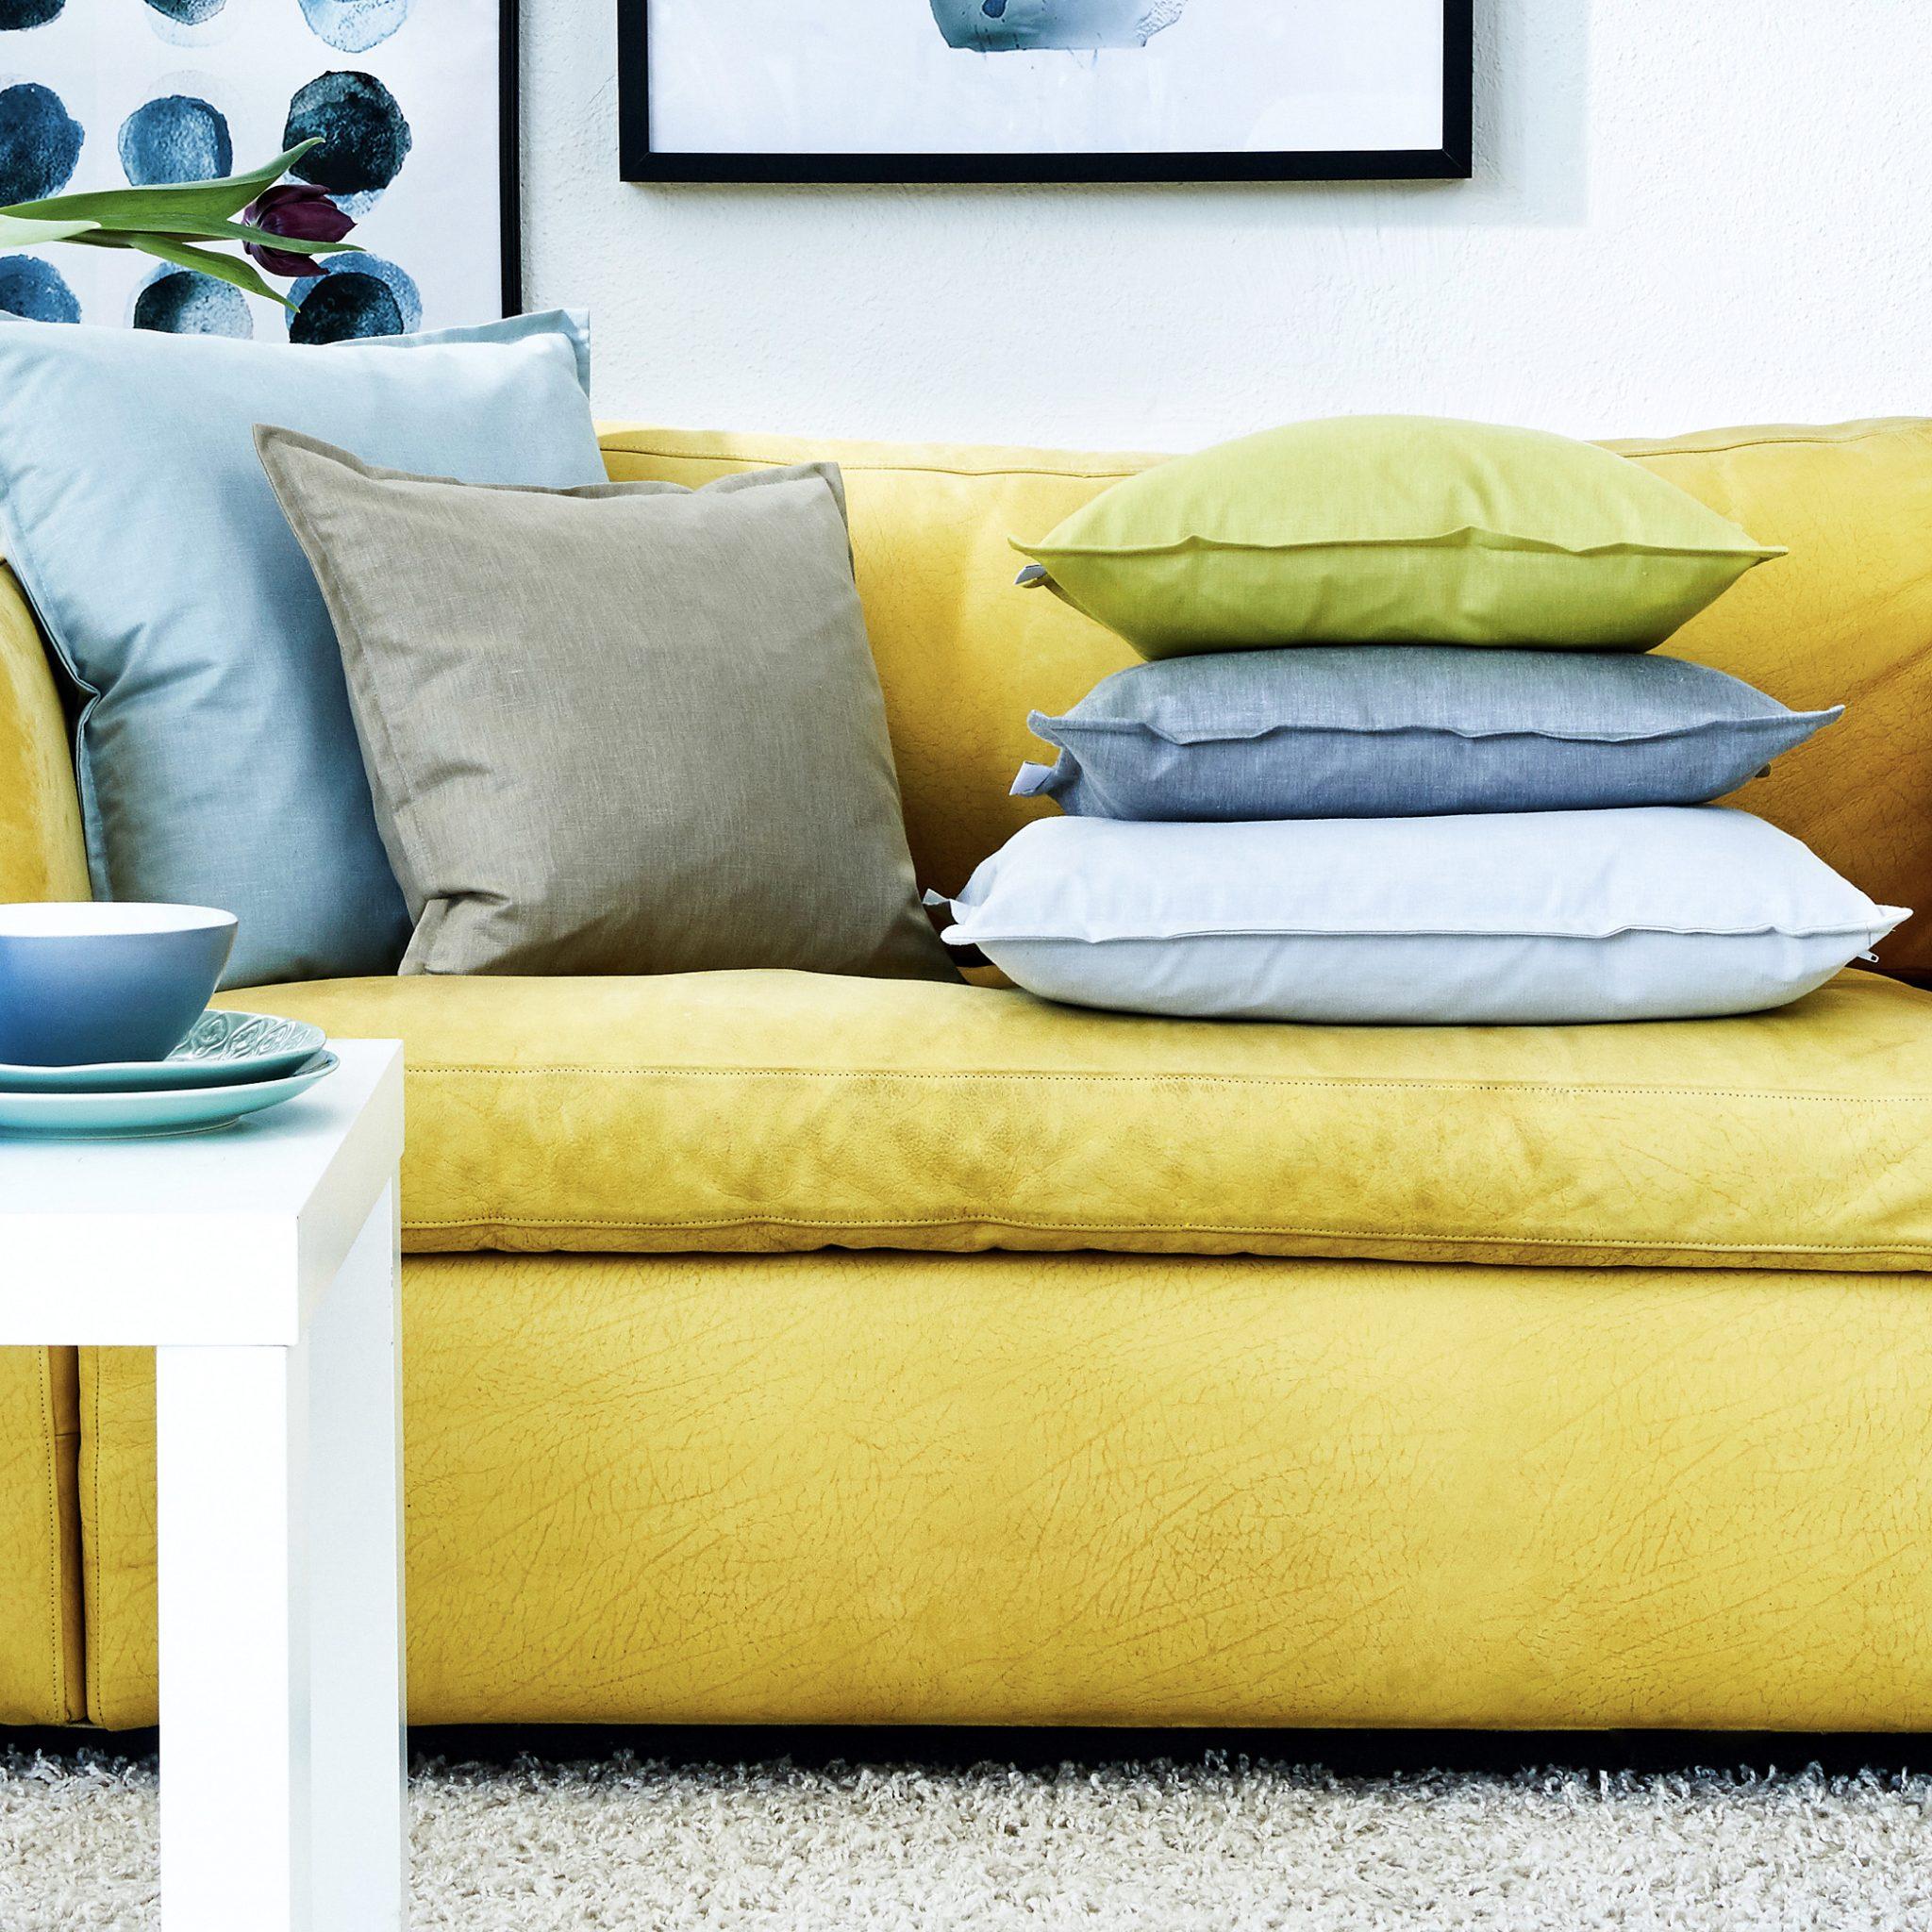 dekokissen apelt alaska dunkelgrau 50x50 l ster laster. Black Bedroom Furniture Sets. Home Design Ideas